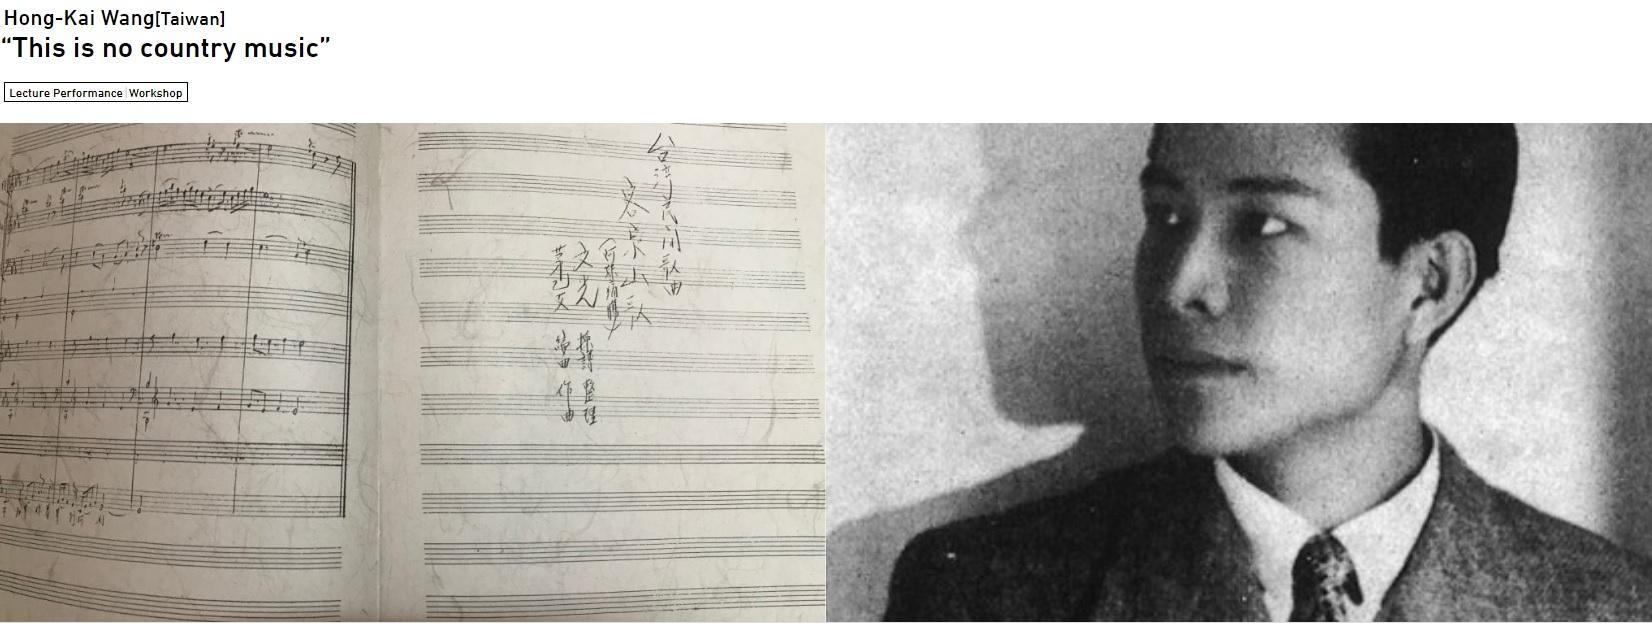 Late Taiwan musician Jiang Wen-ye remembered at Tokyo festival